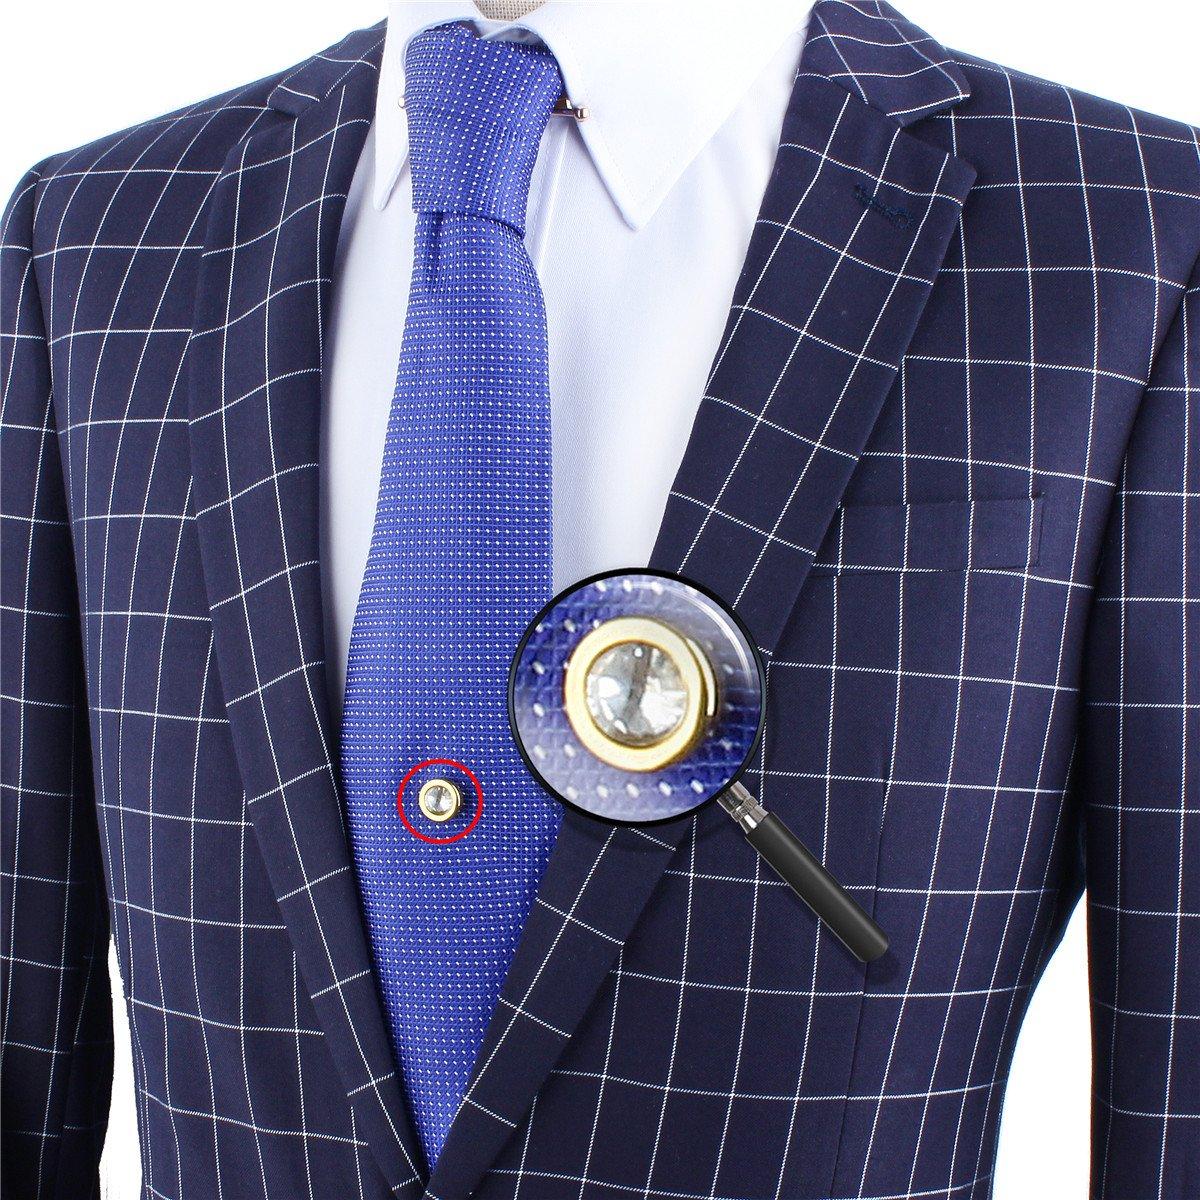 HAWSON Mens Tie Tack with Chain Round Crystal Wedding Business Accessories 20216